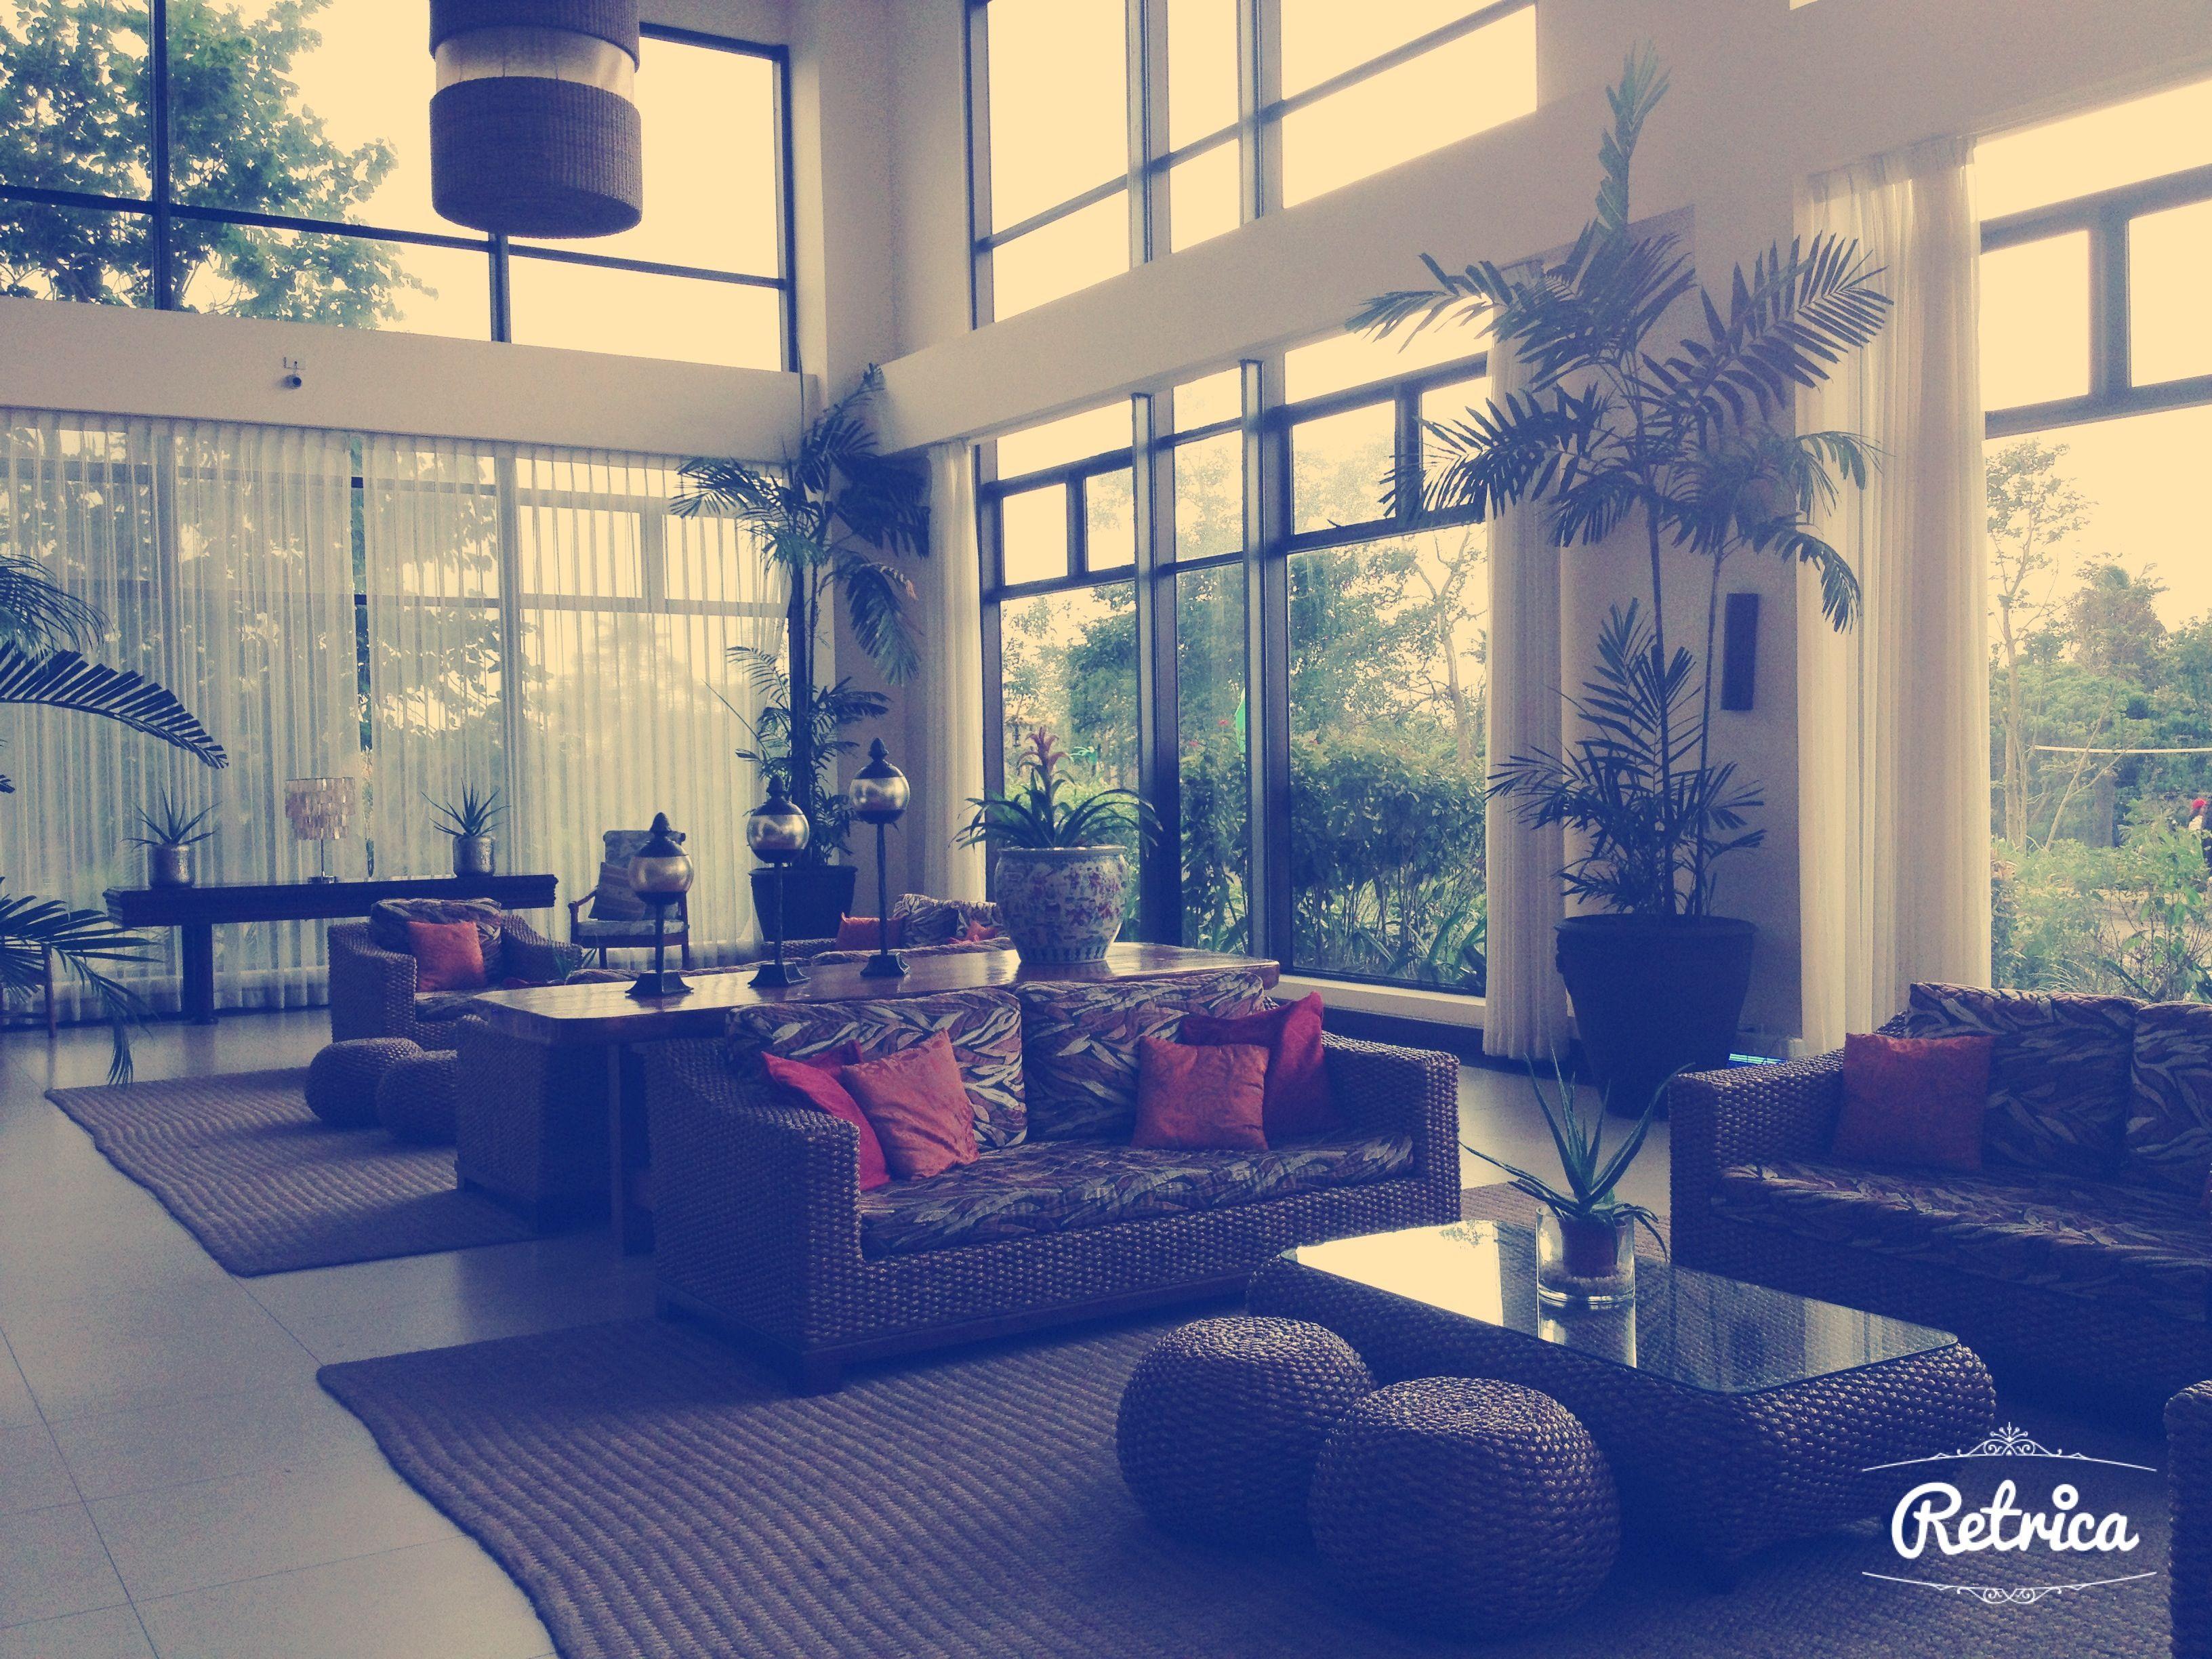 Resort feel - Hotel Kimberly, Tagaytay, Philippines. Low ...